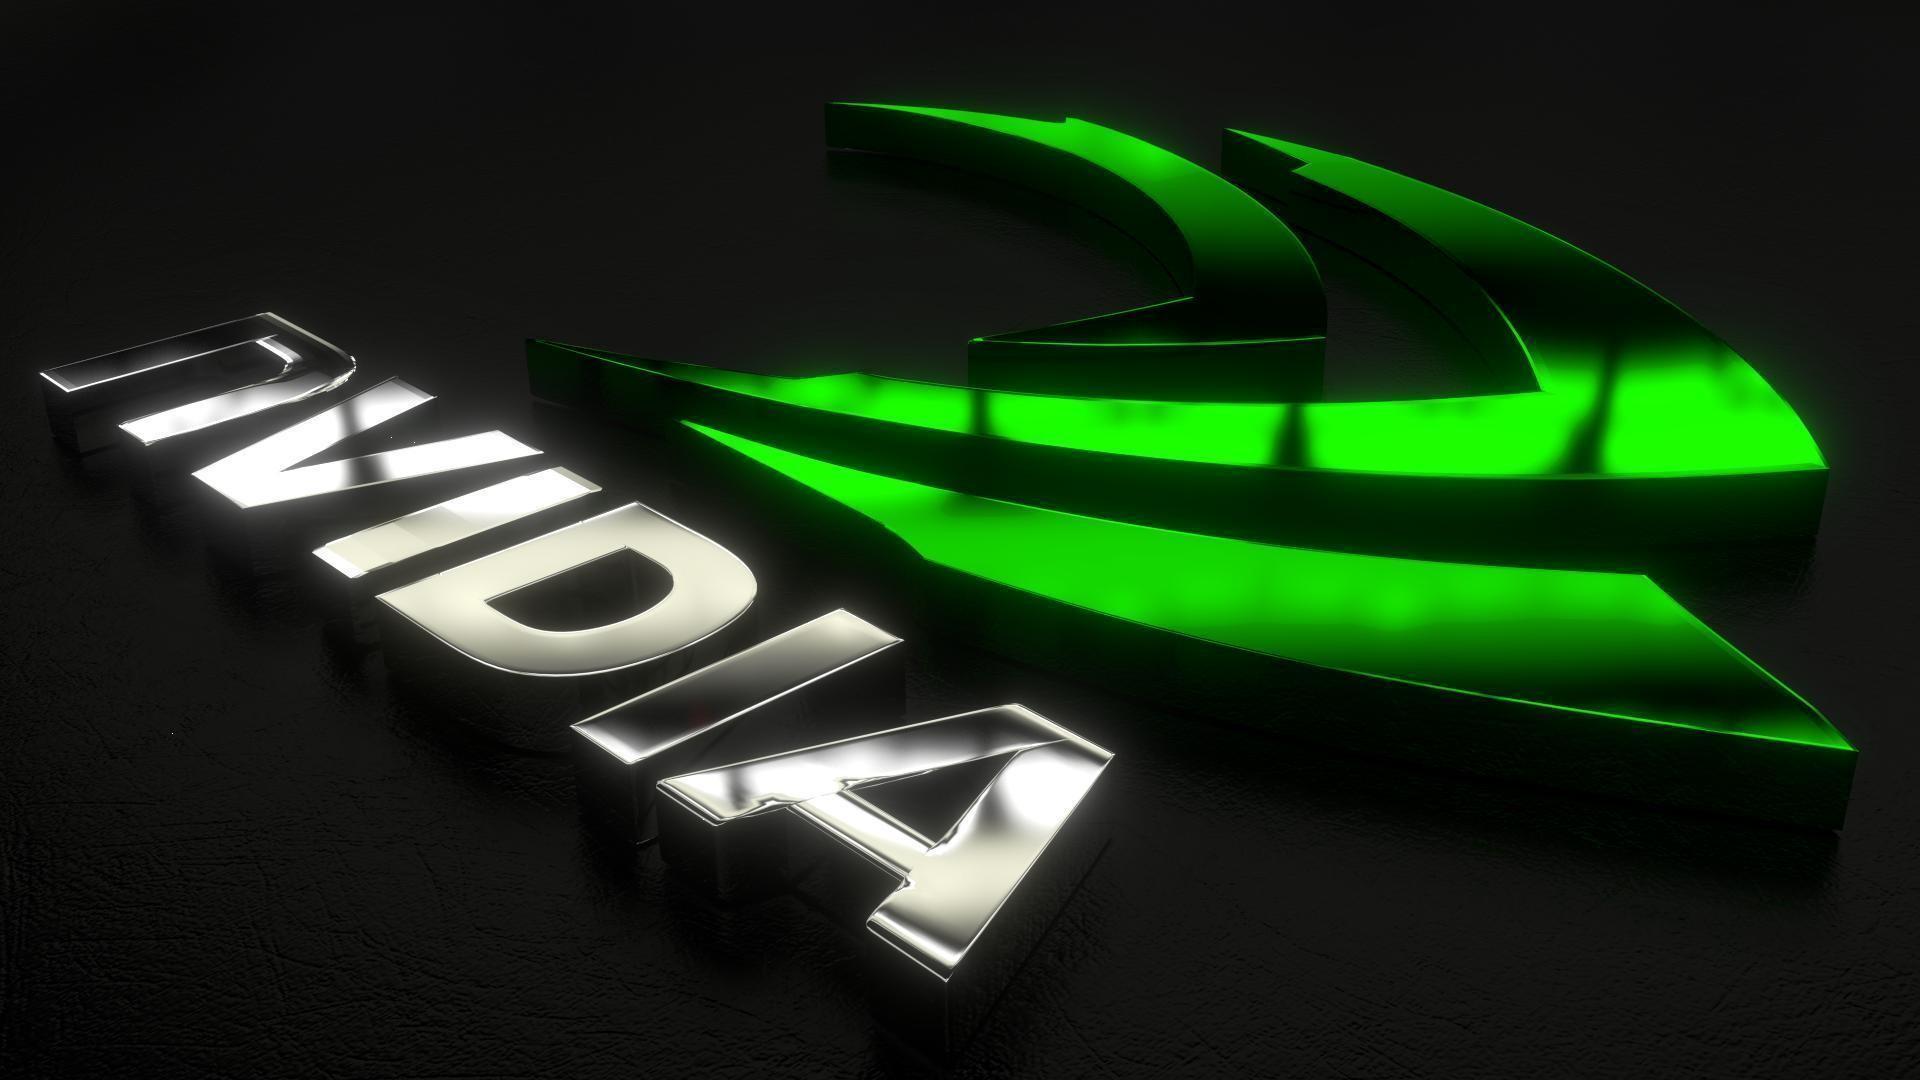 Nvidia wallpapers 4k 72 images - 1920x1080 wallpaper nvidia ...